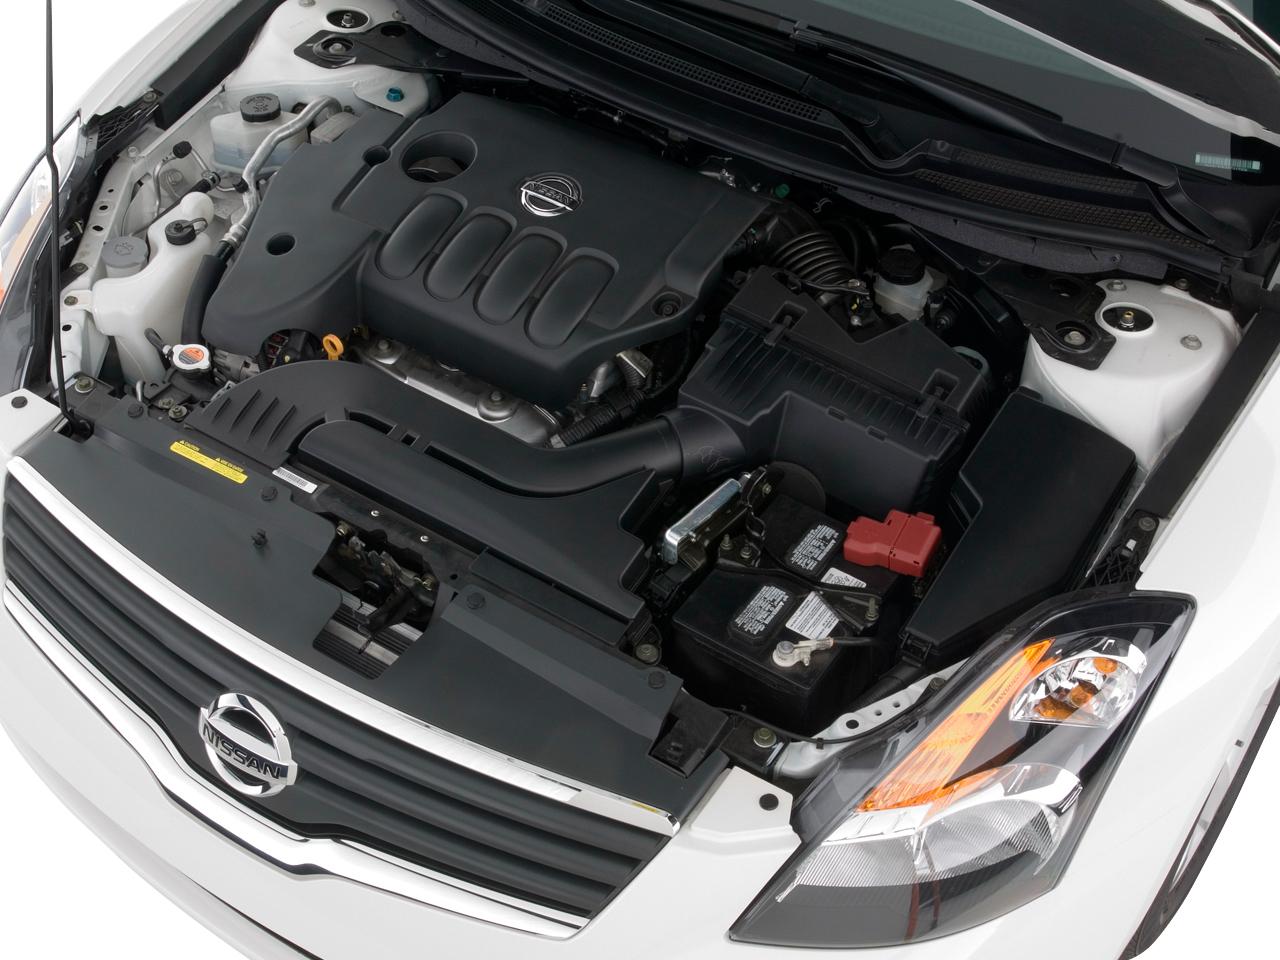 2009 Nissan Altima Hybrid Midsize Review Engine Diagram 61 124